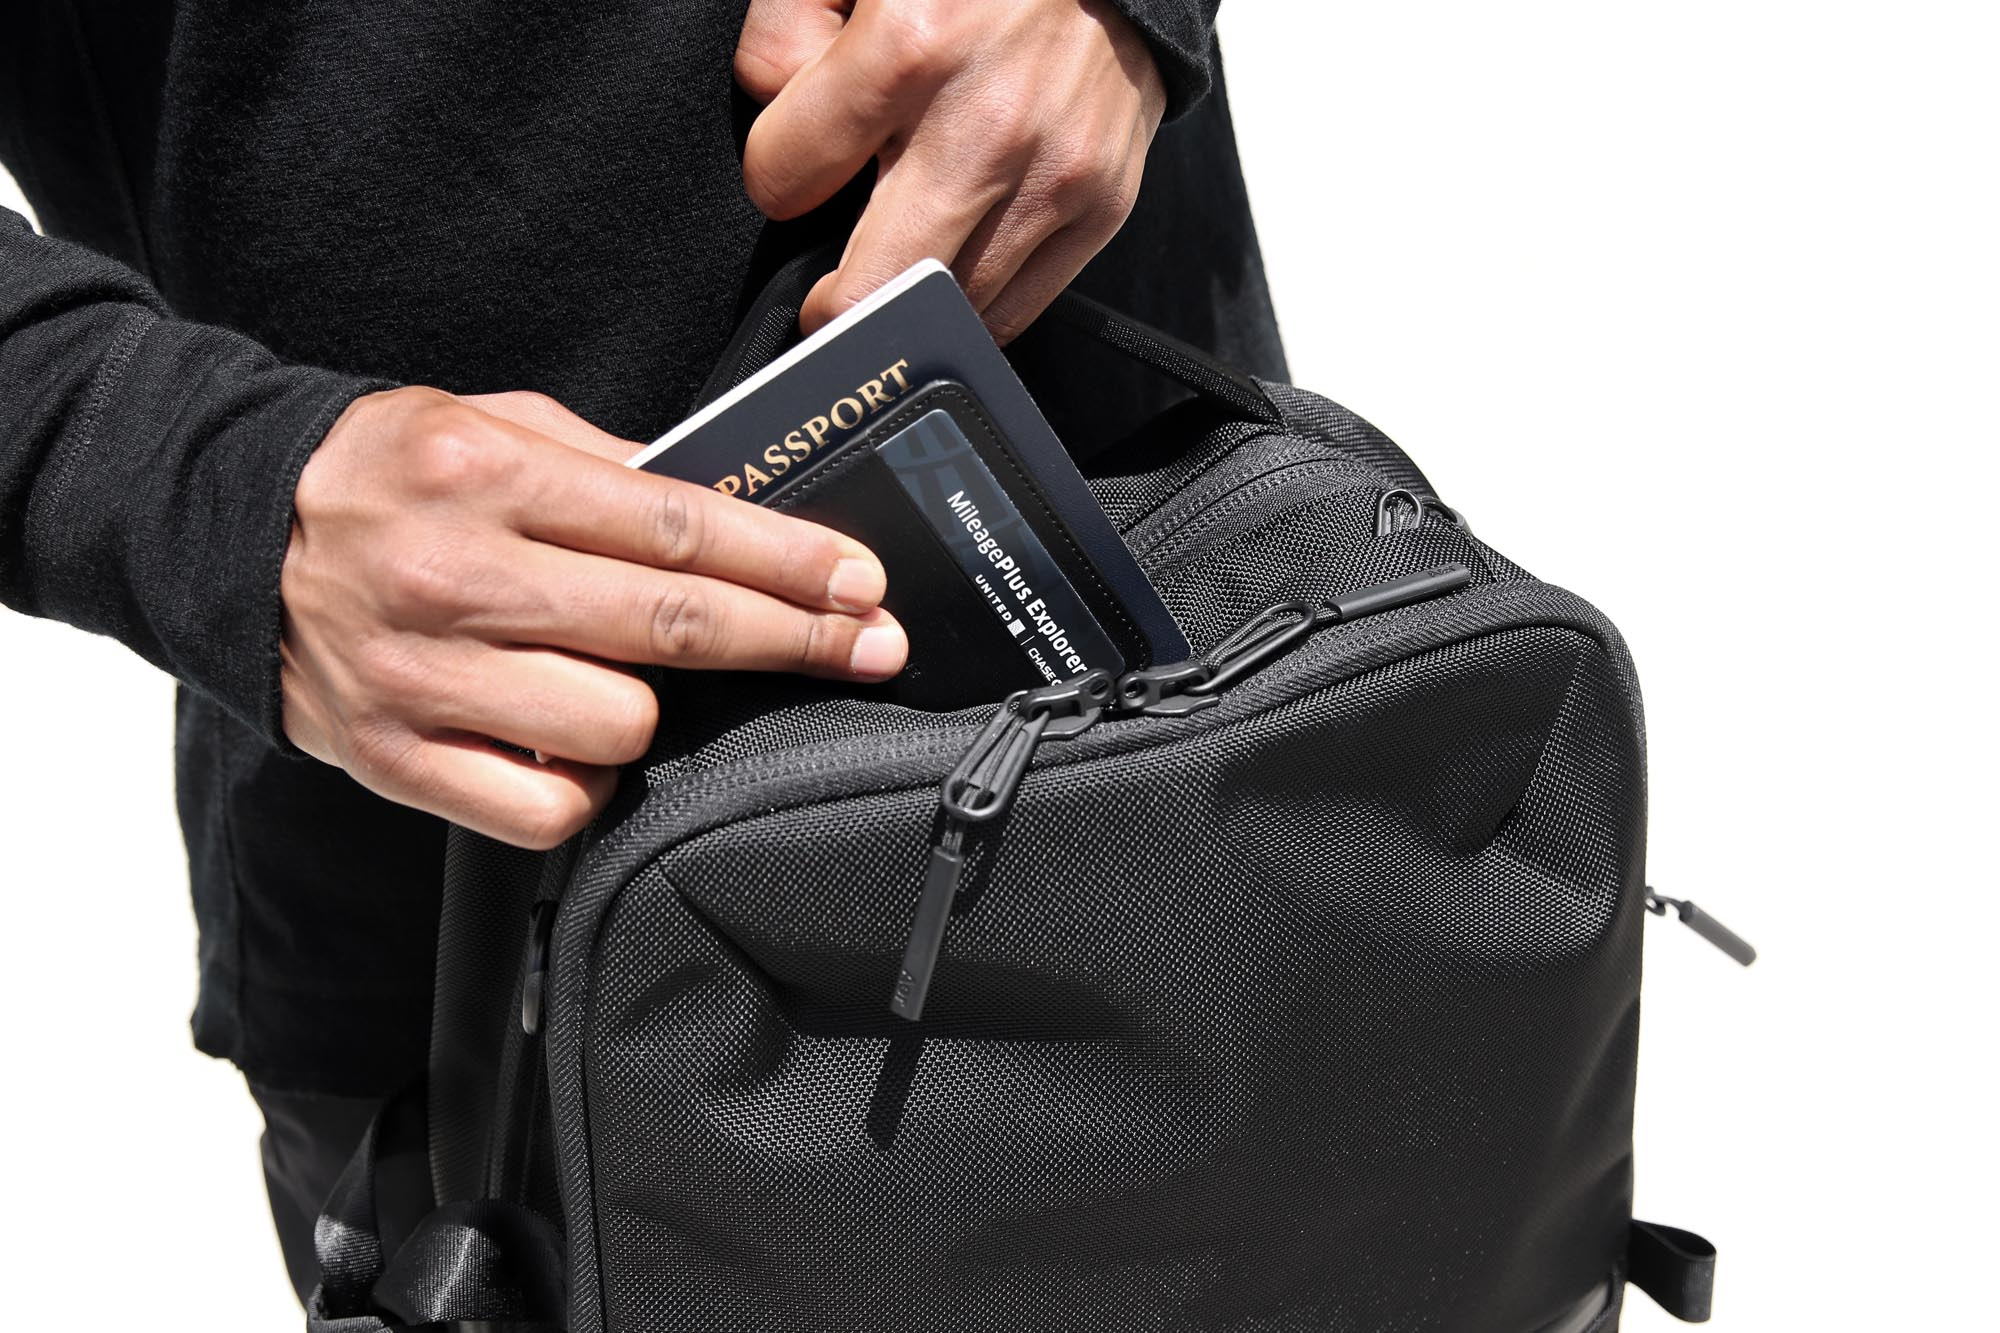 21010_flt2_black_passport.JPG